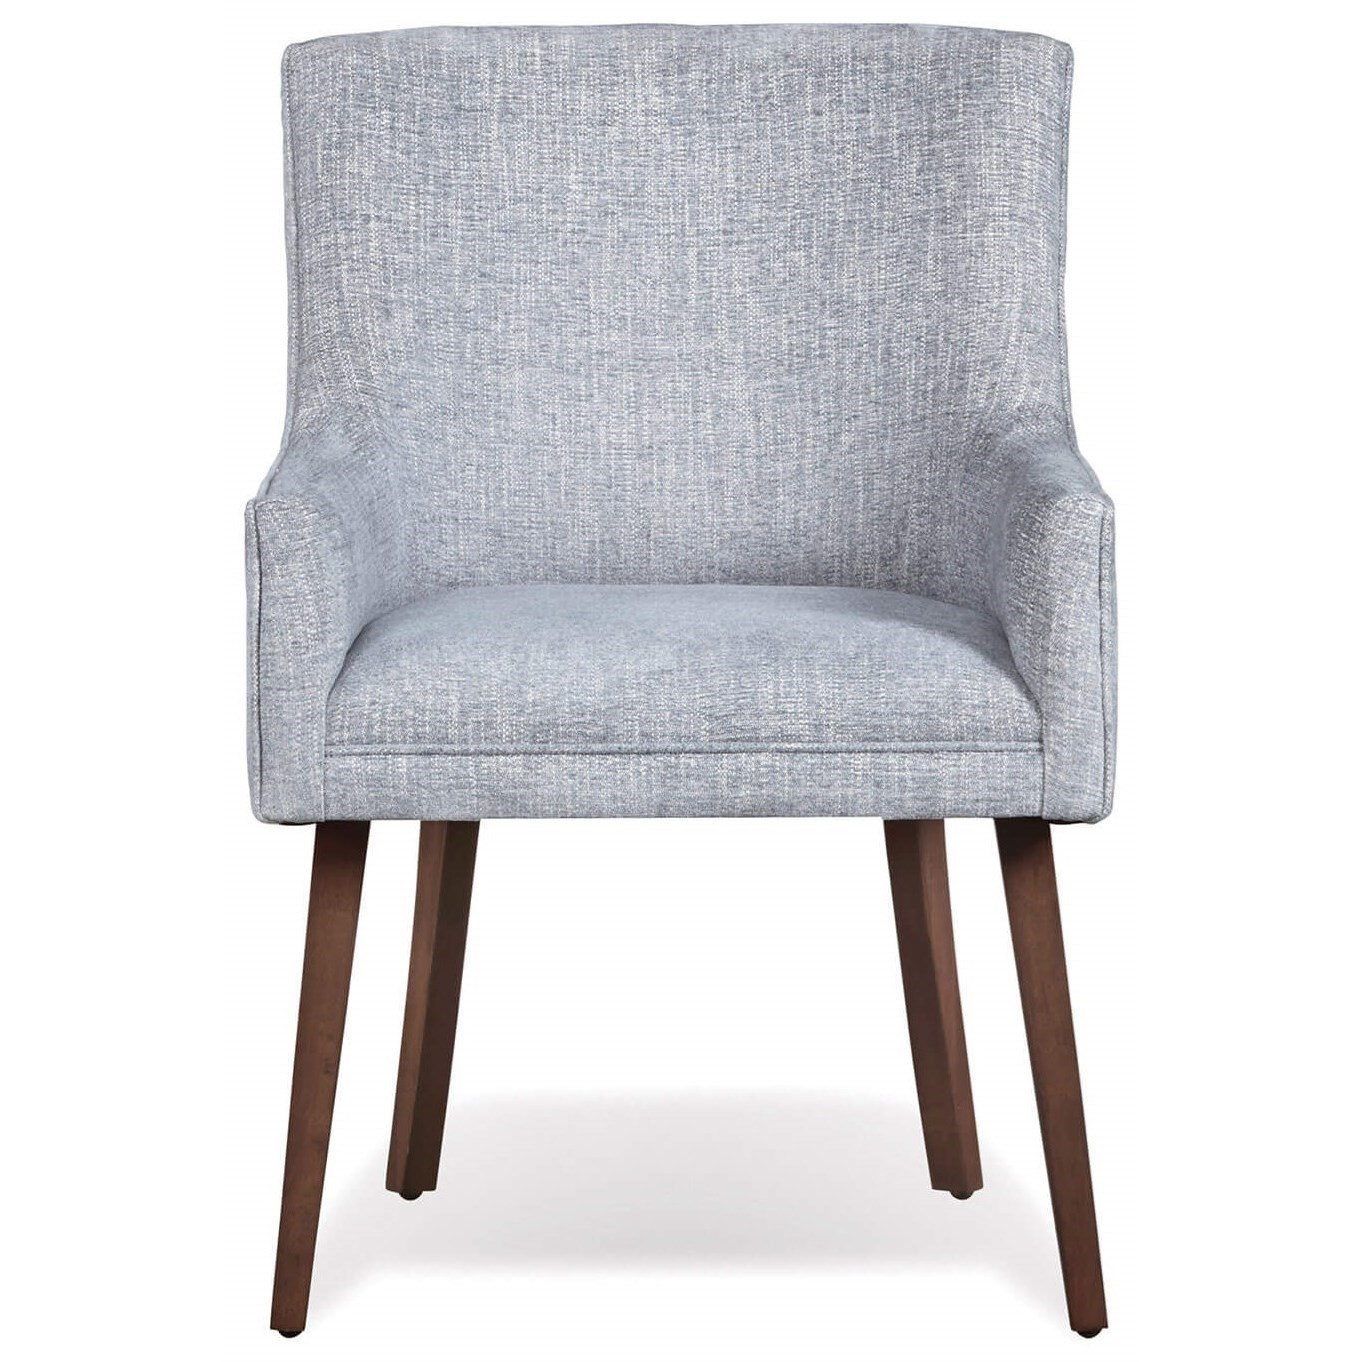 Boulevard Arch Arm Chair by Palliser at Stoney Creek Furniture